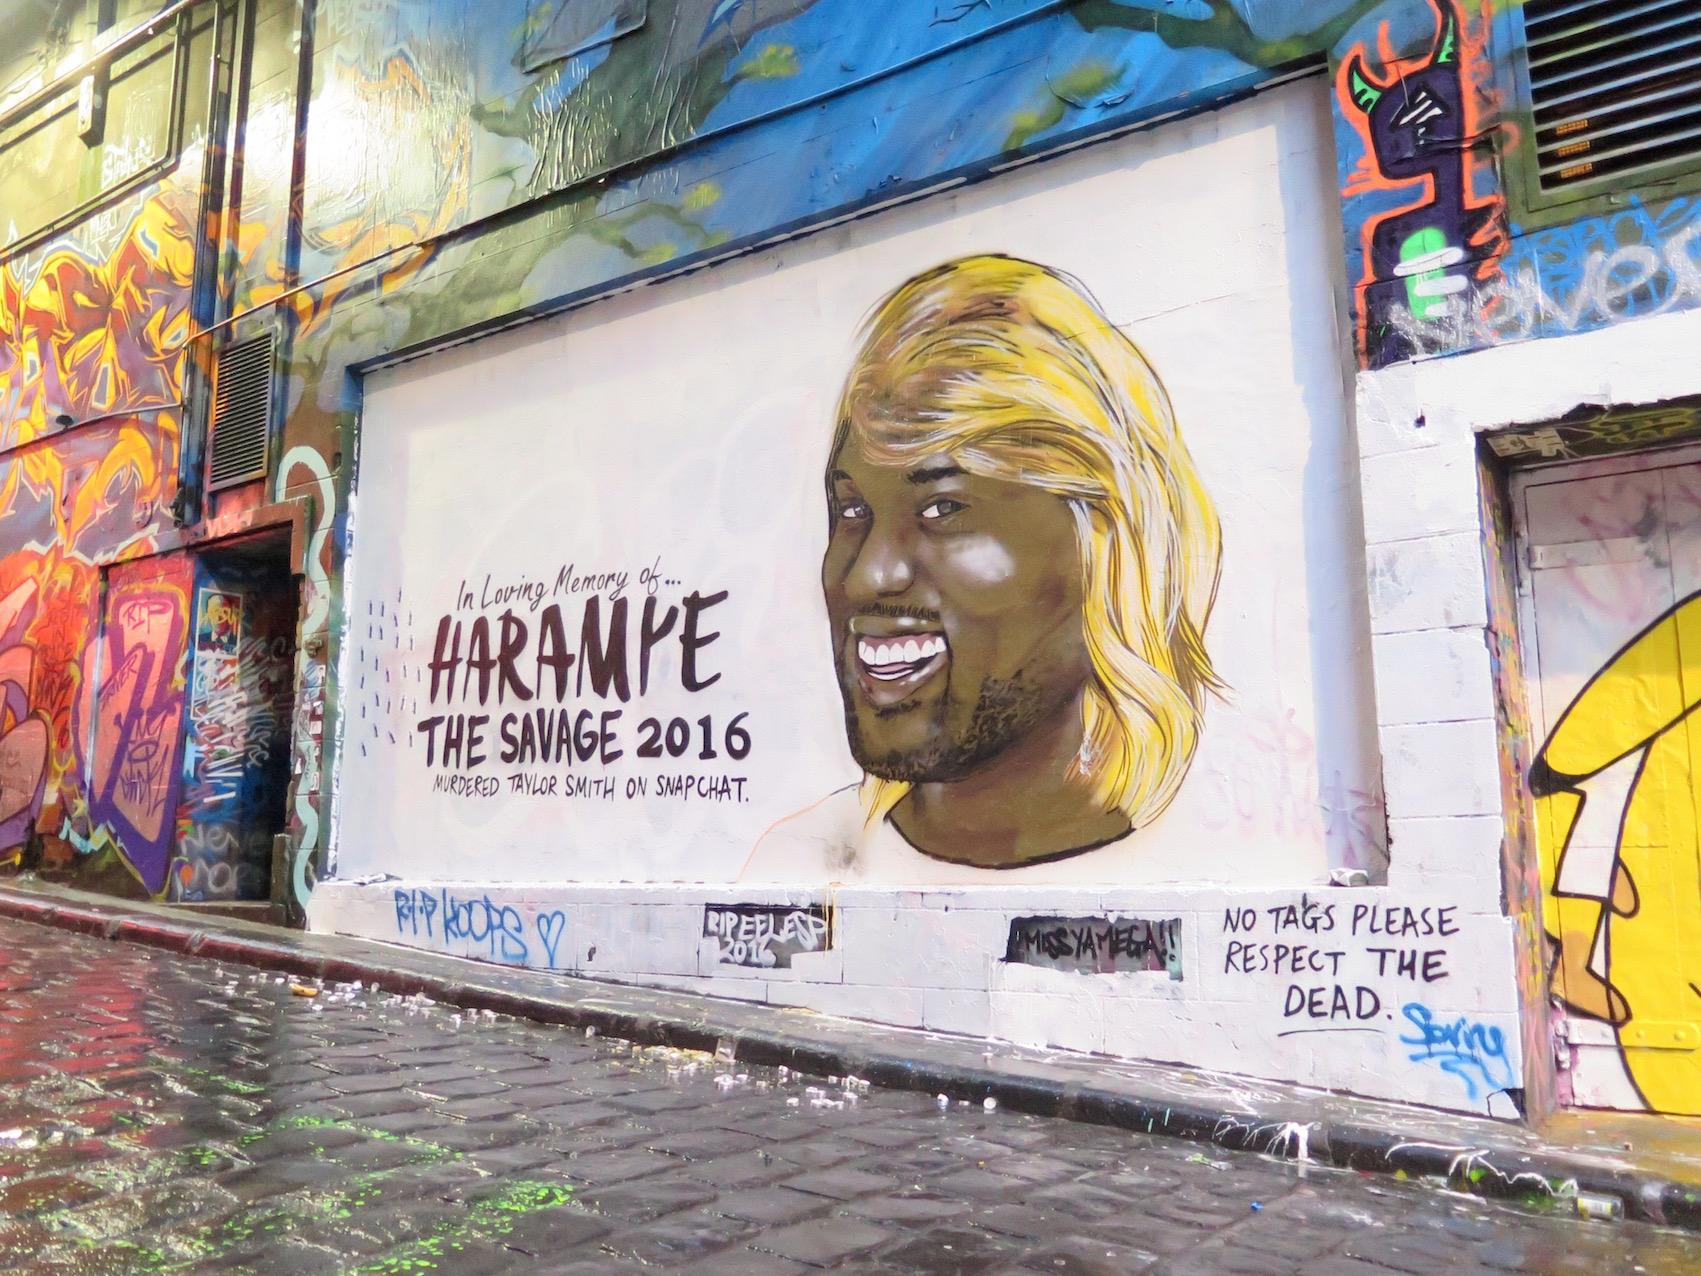 deansunshine_landofsunshine_melbourne_streetart_graffiti_Lush celebrity hosier lane 3 Kanye west Kimye 3